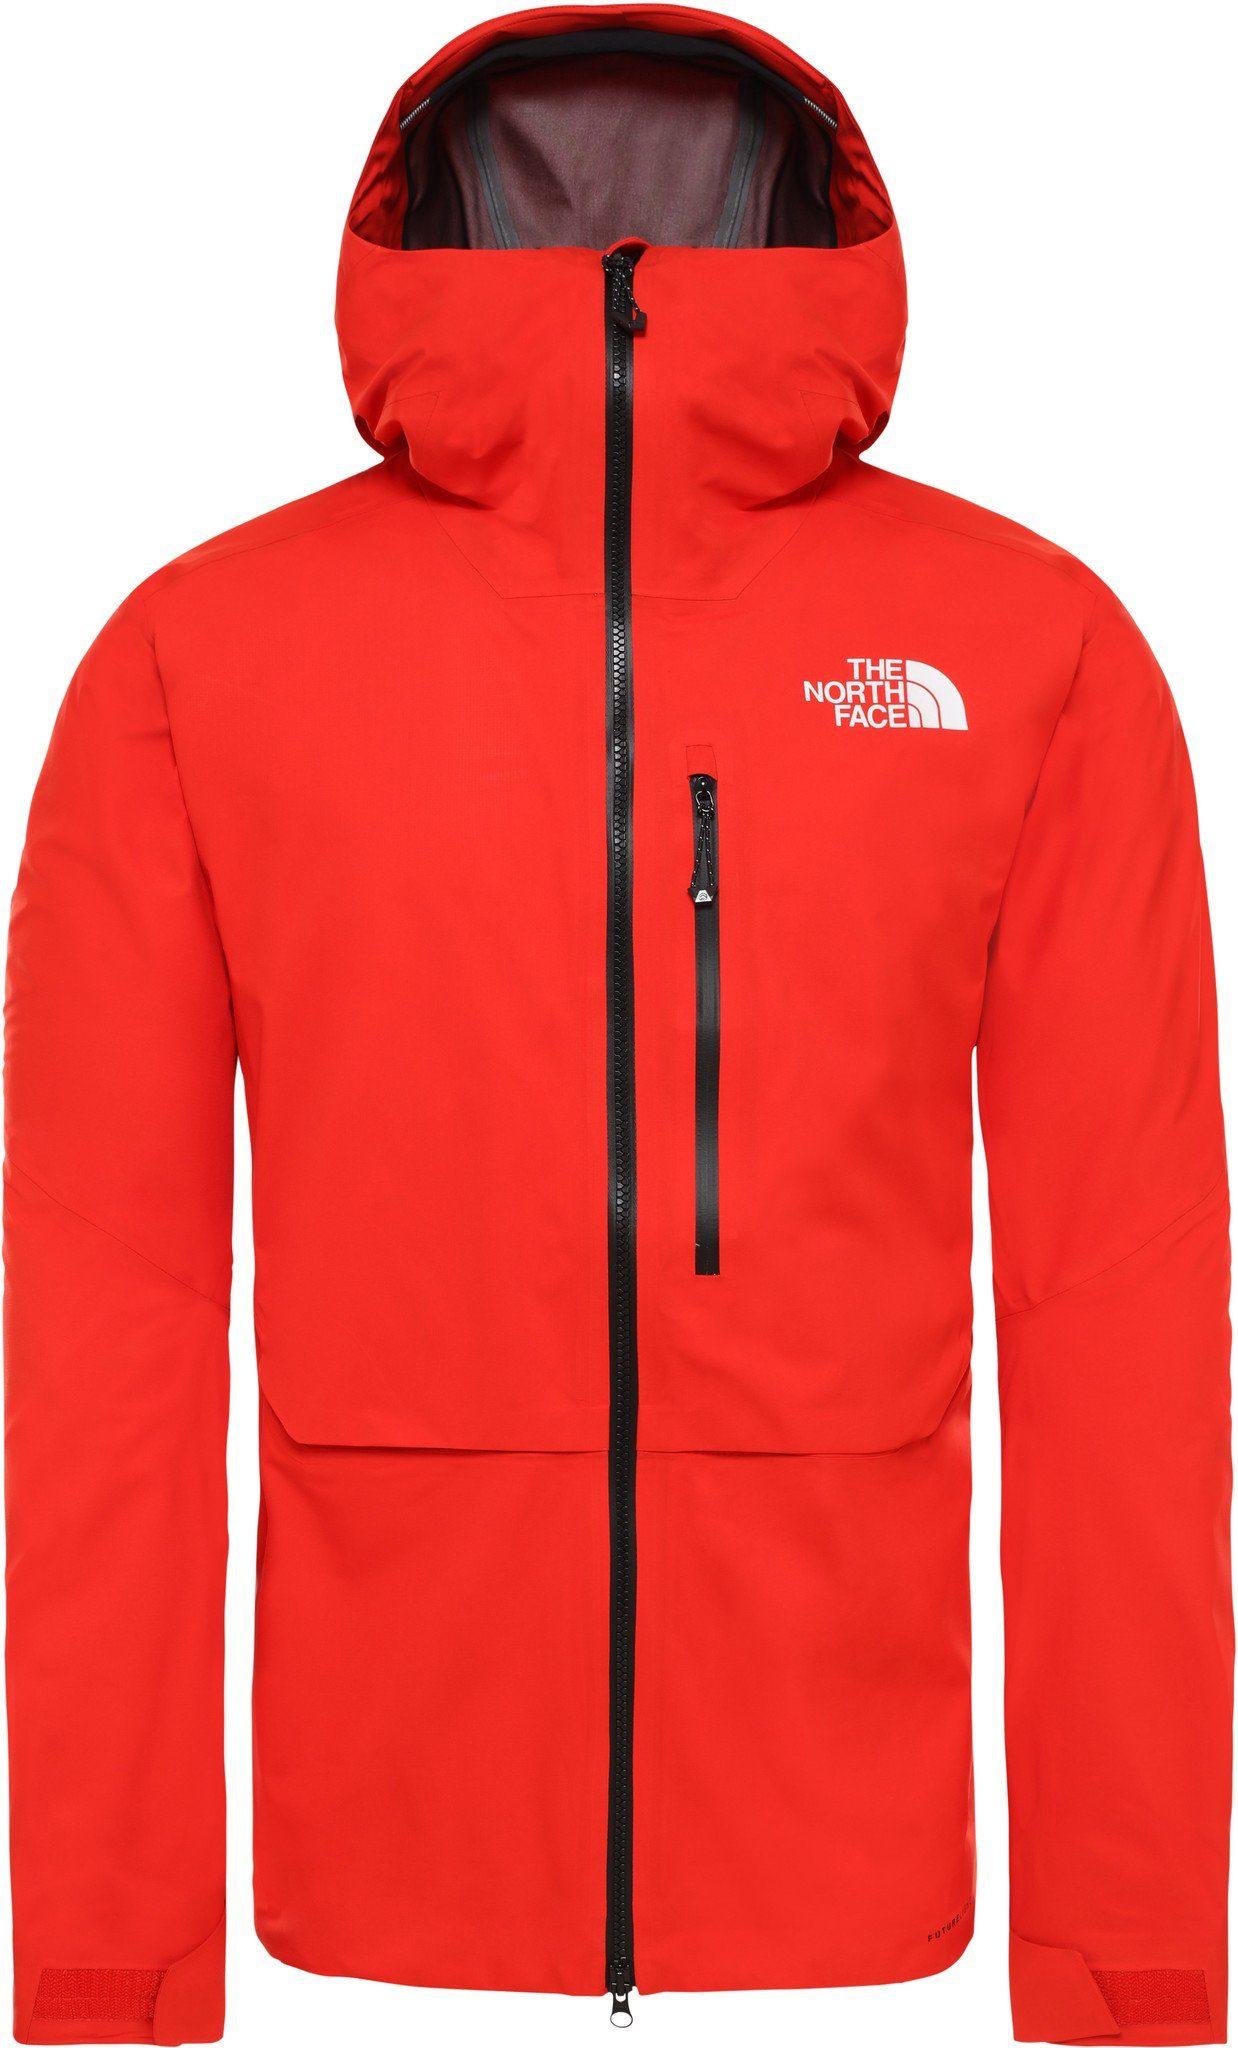 The North Face Outdoorjacke »L5 Light Jacke Herren« online kaufen | OTTO